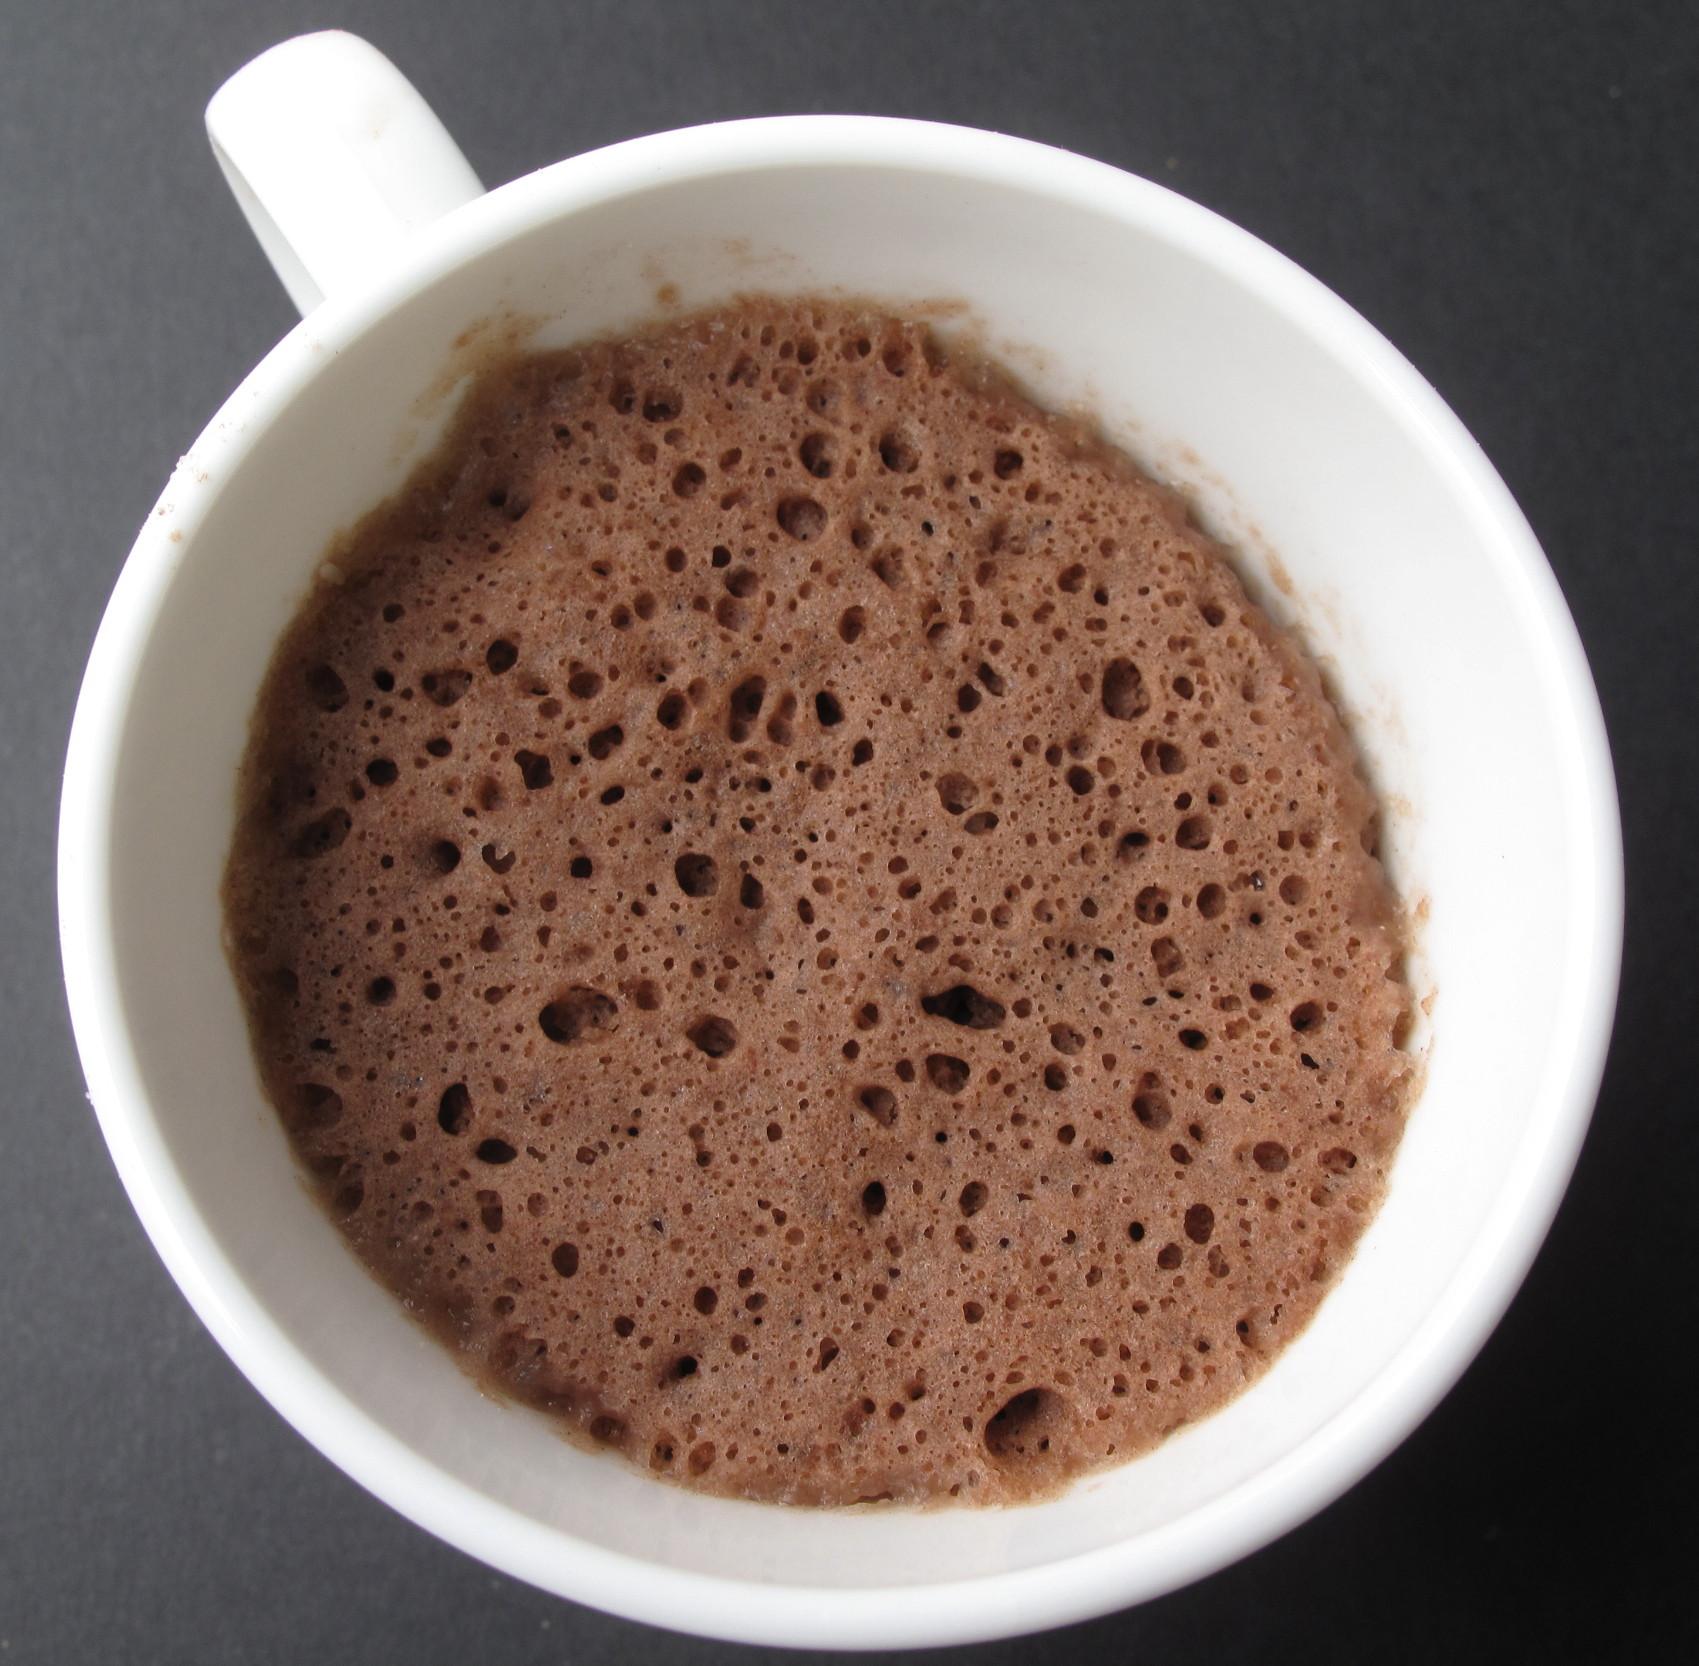 Easy Mug Recipes: 3-2-1 Magic Mug Cake